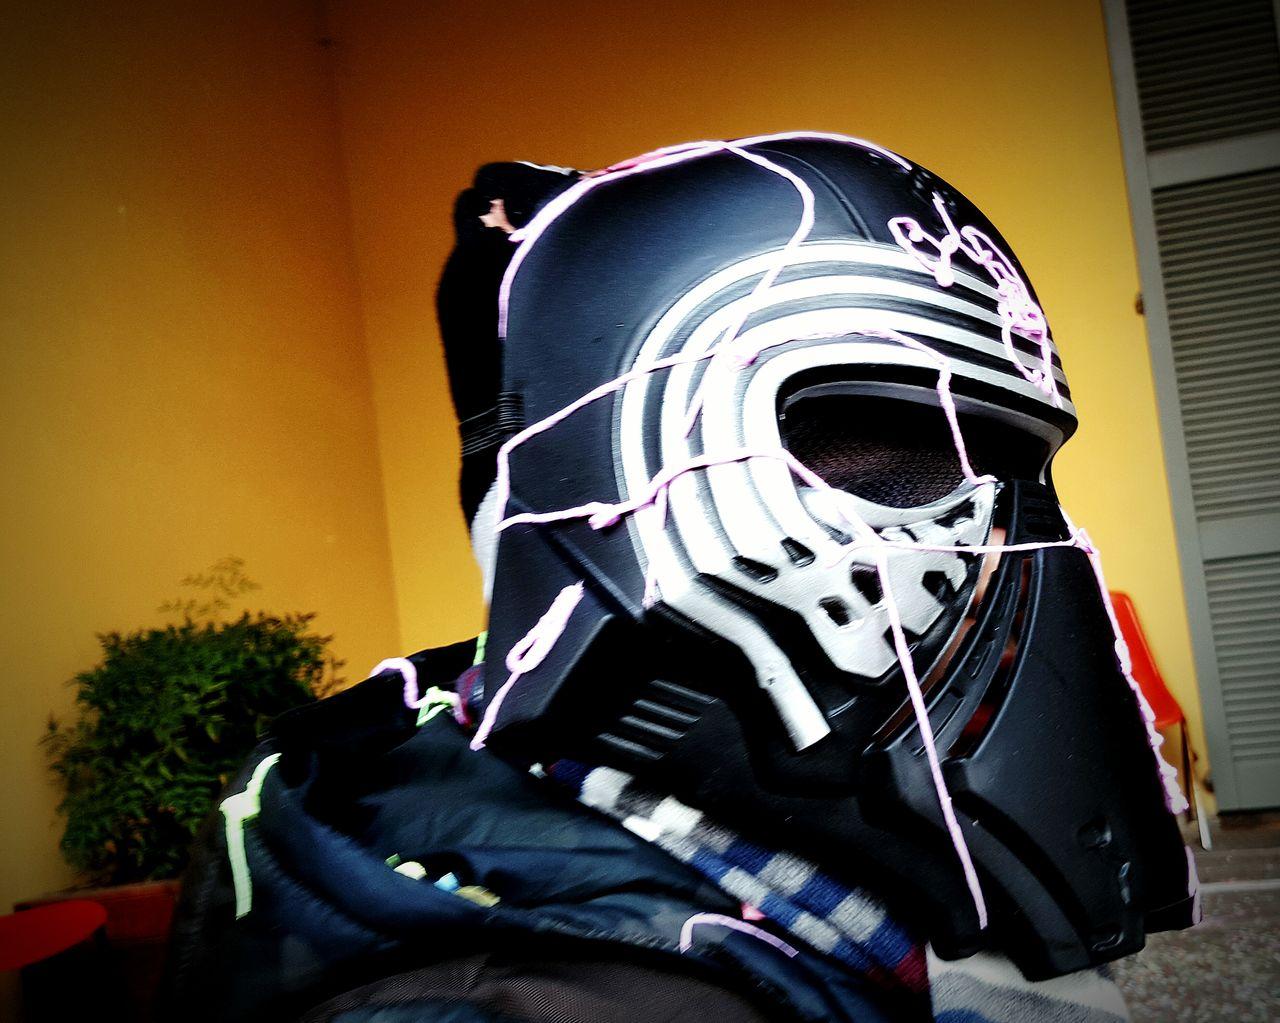 Carnevale Carnevale Di Venezia Maschera Mascherato Star Wars Urban City Citta Colori Dark Mascherina Kio Ren